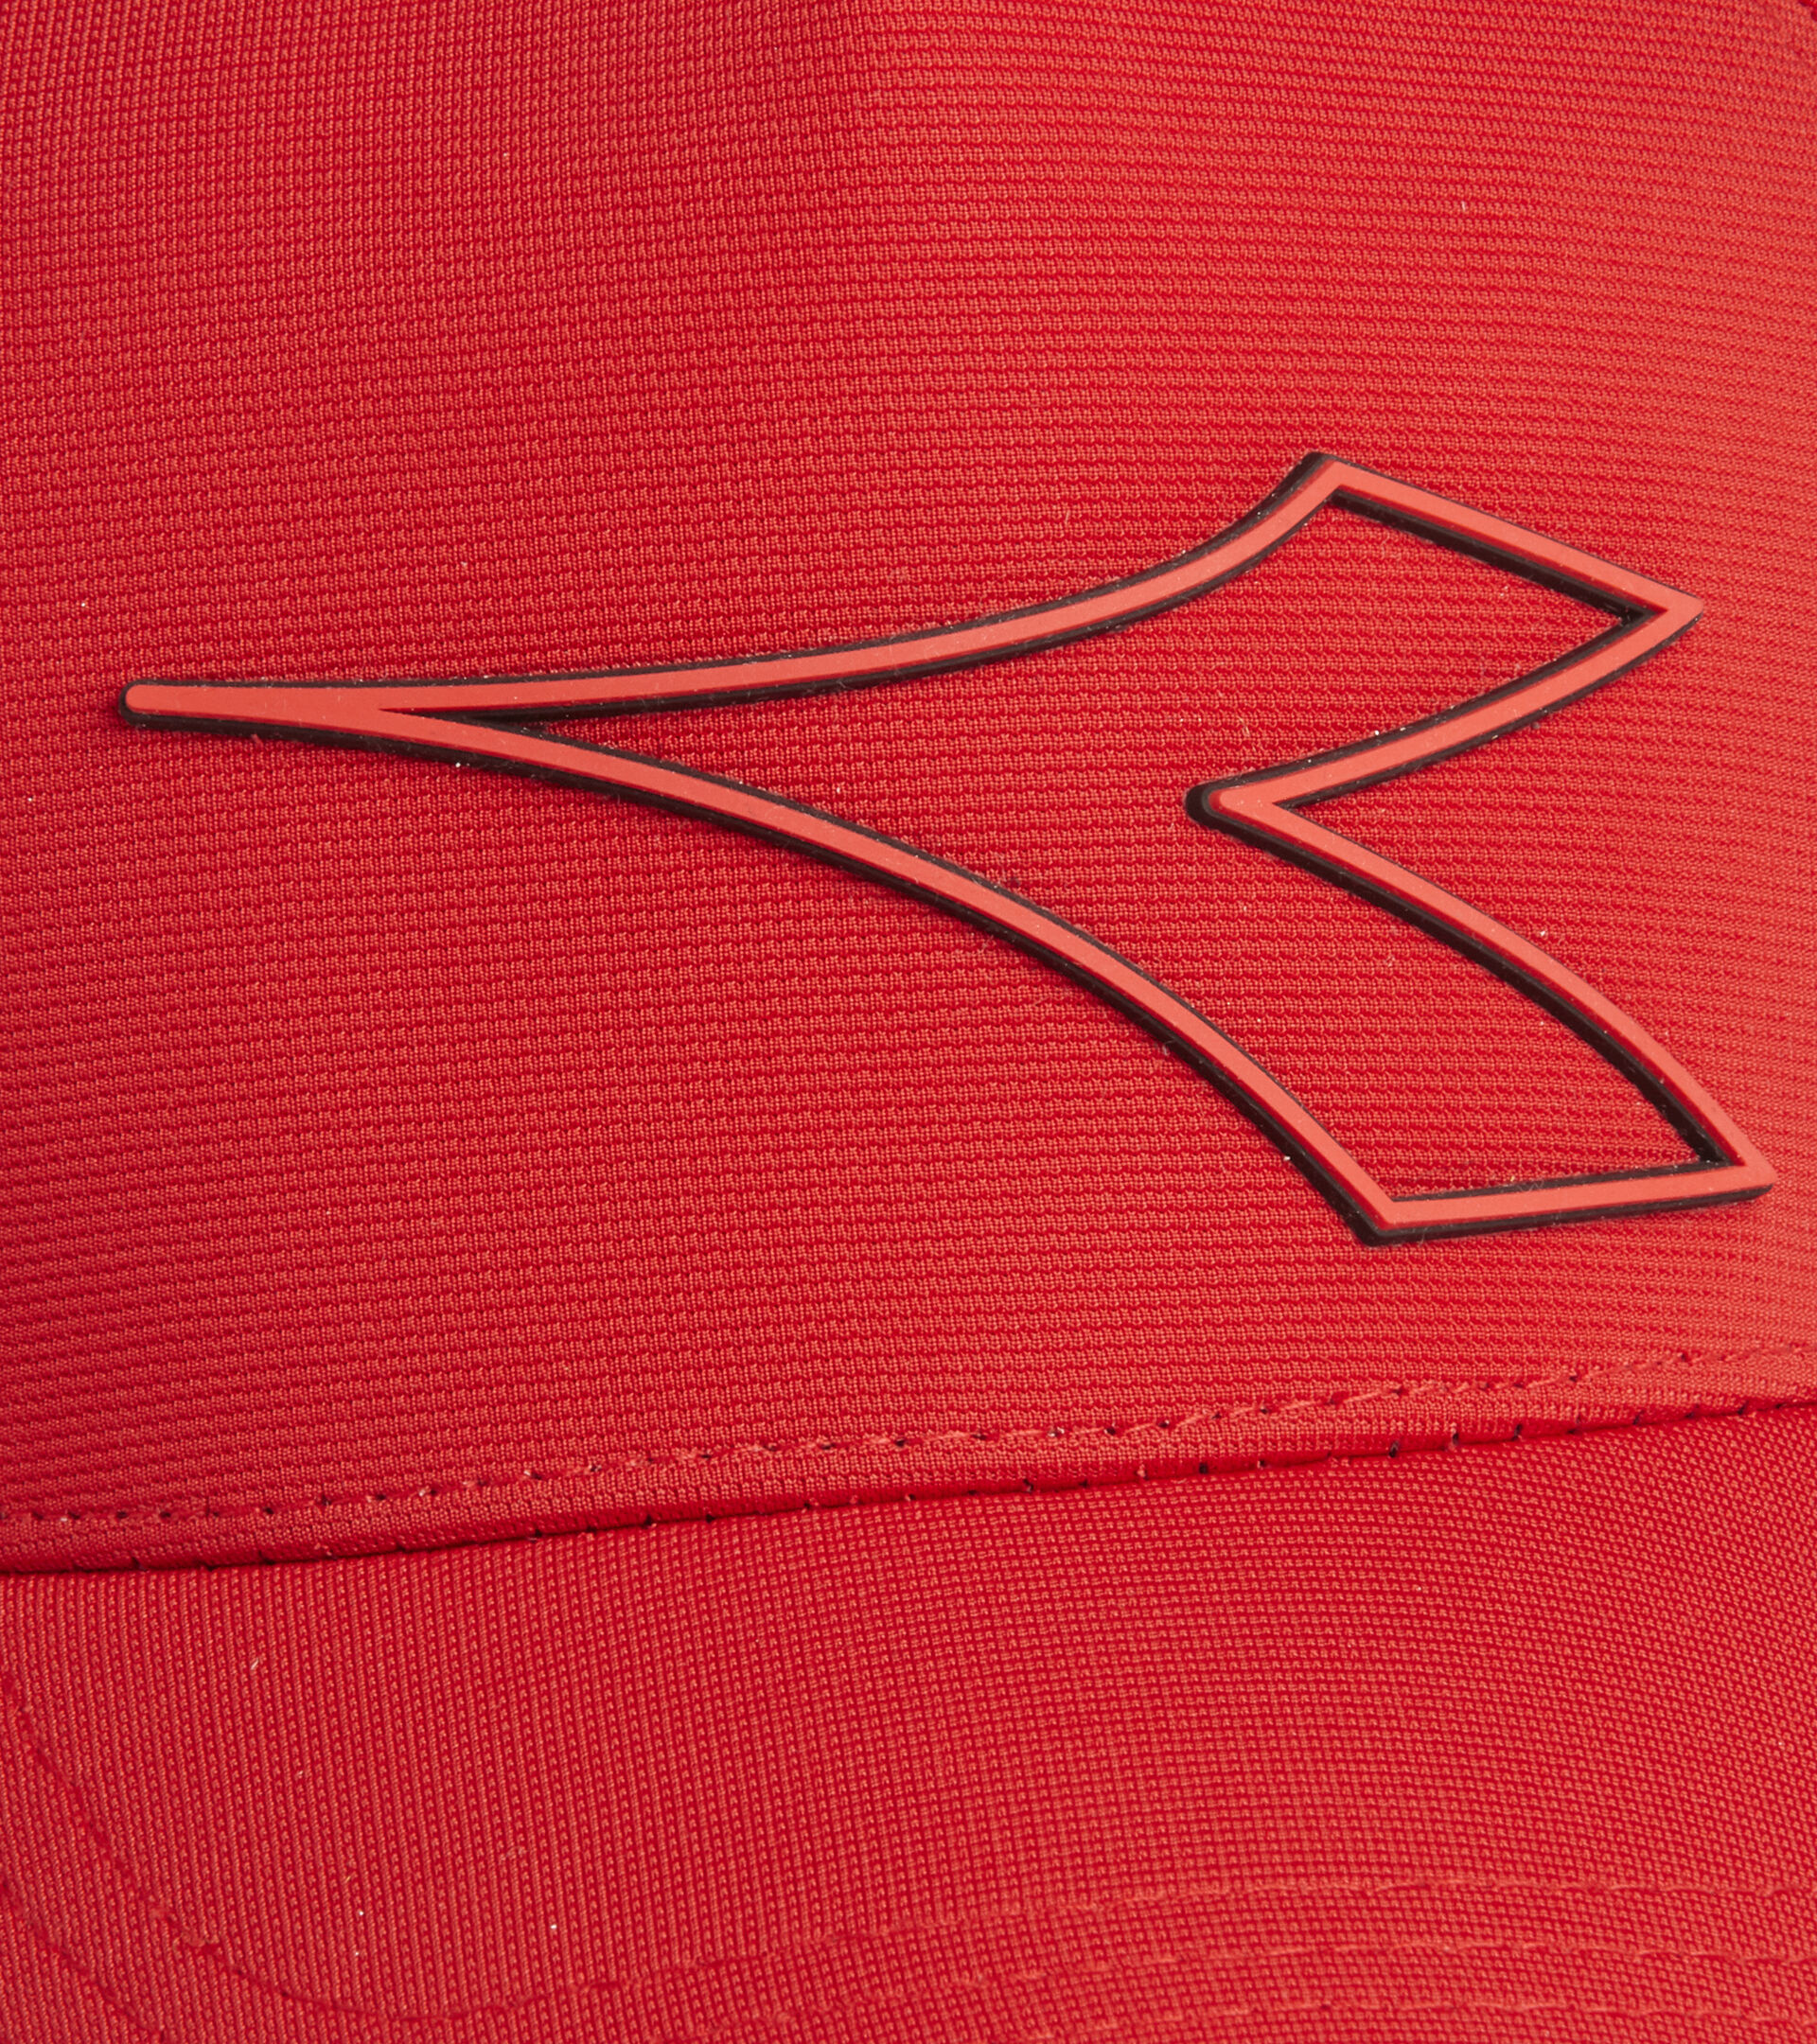 Accessories Utility UNISEX BASEBALL CAP TRUE RED Utility